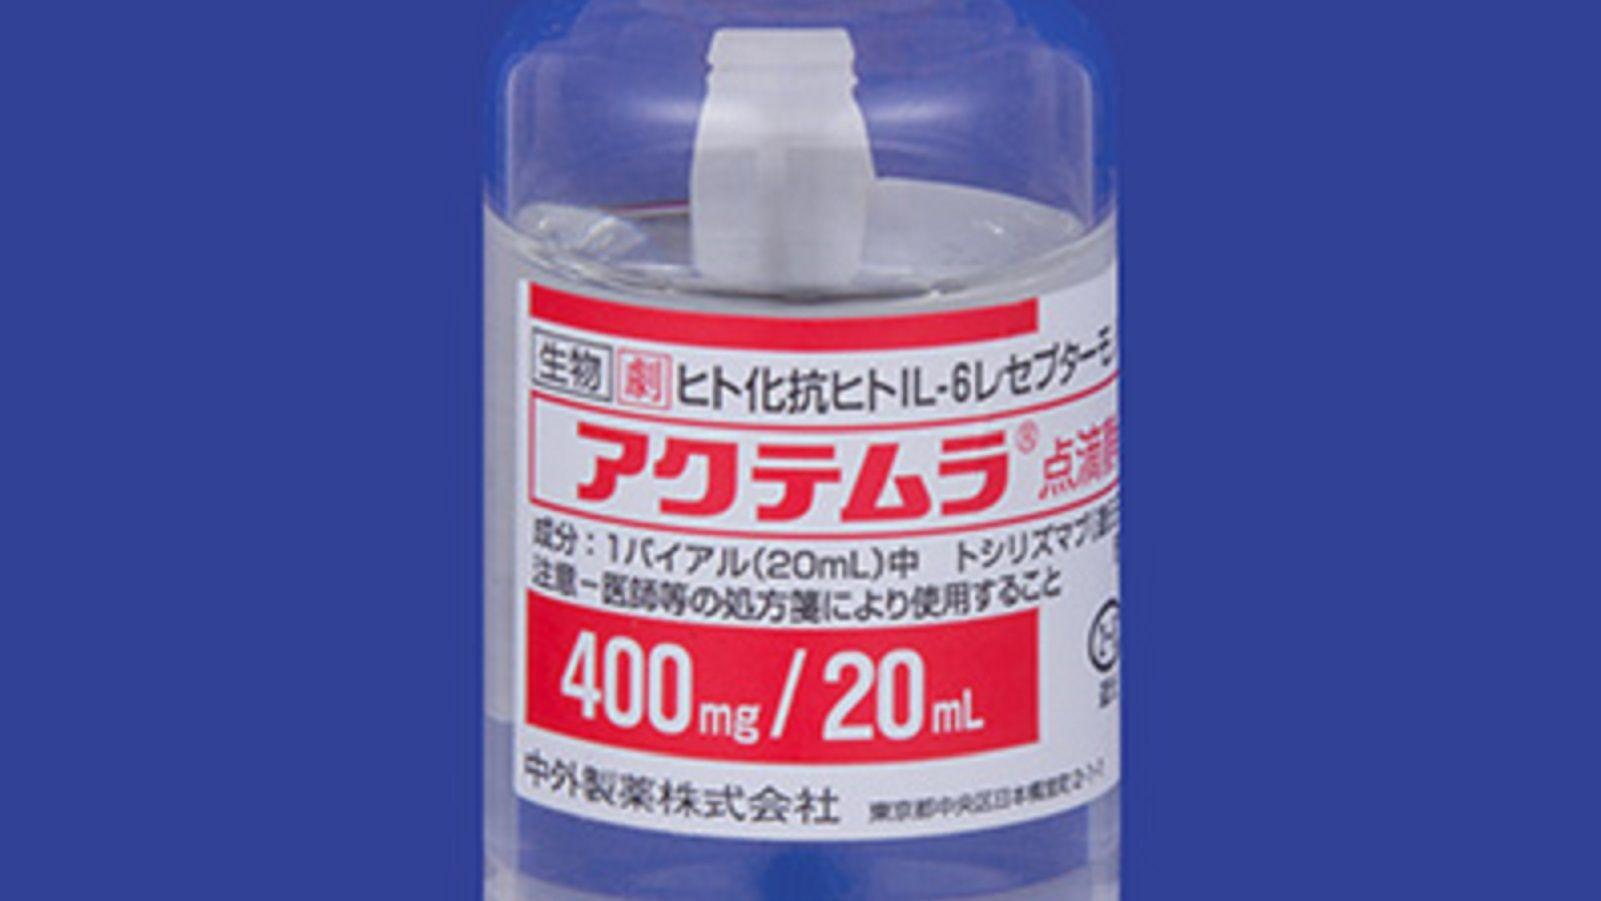 富士 薬品 コロナ